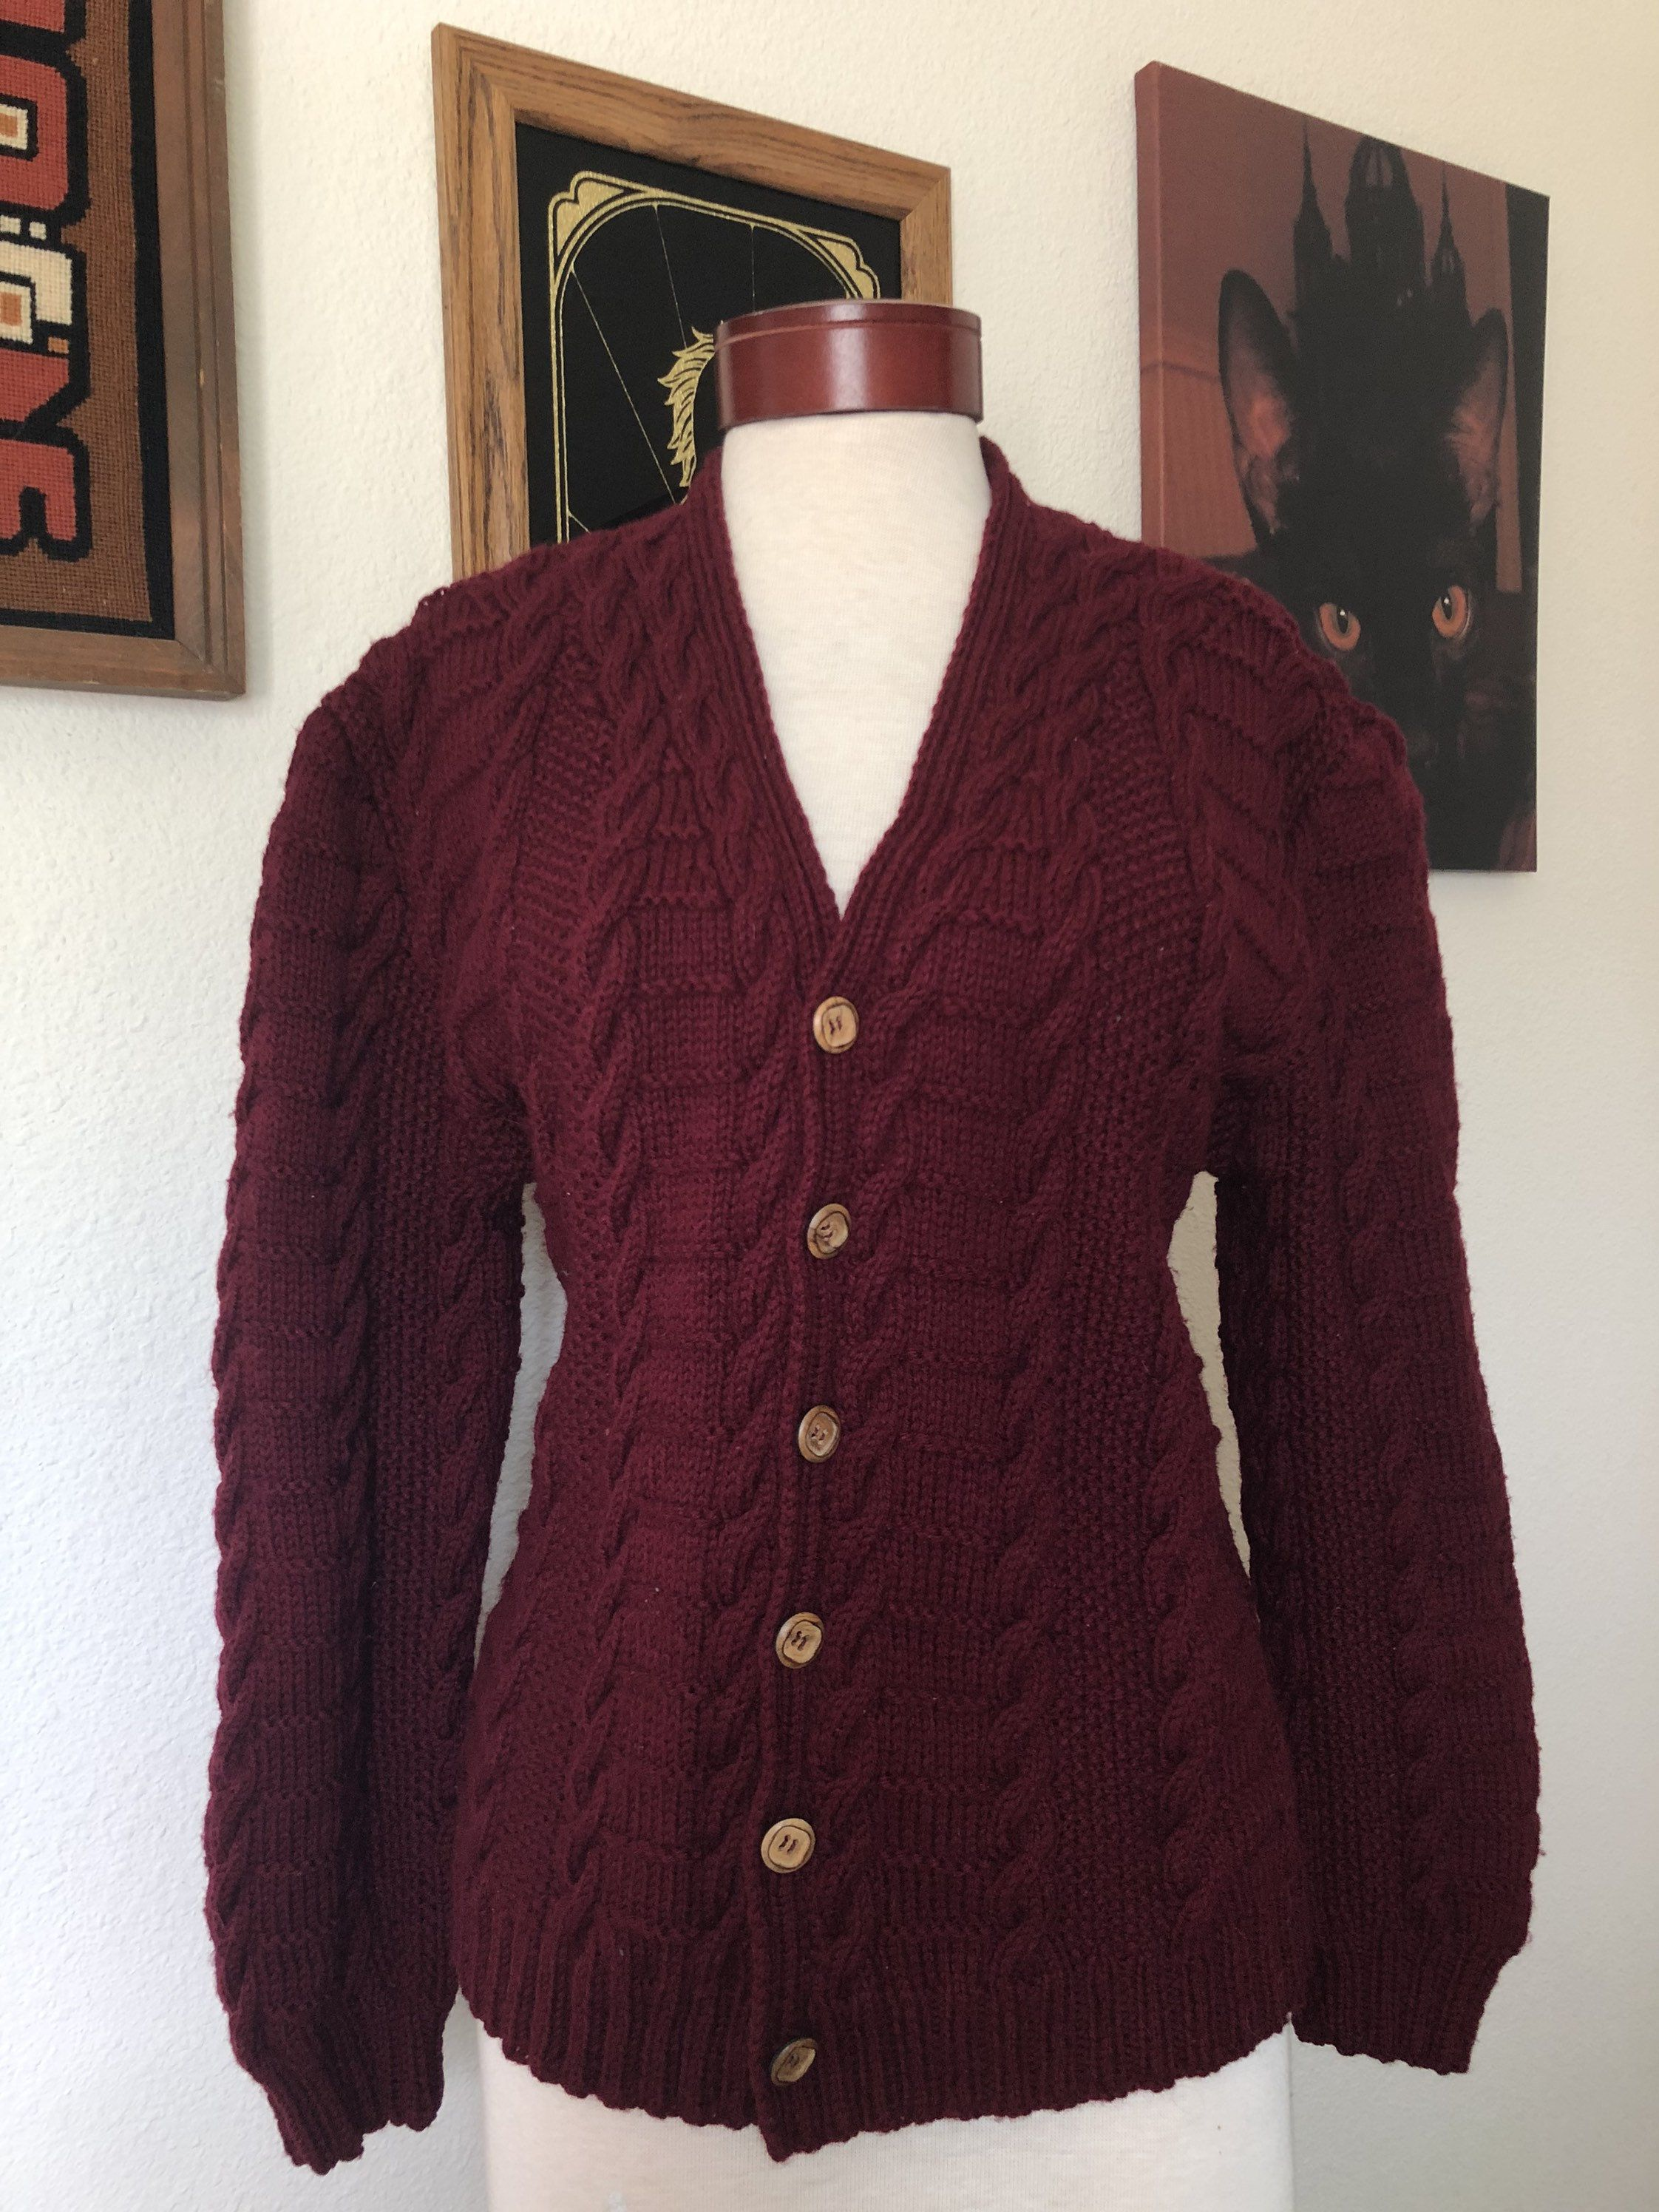 Button Up Cardigan Cardigan Sweater Vintage Maroon Cardigan 80s Vintage Burgundy Cardigan Vintage Burgundy Wine Cardigan